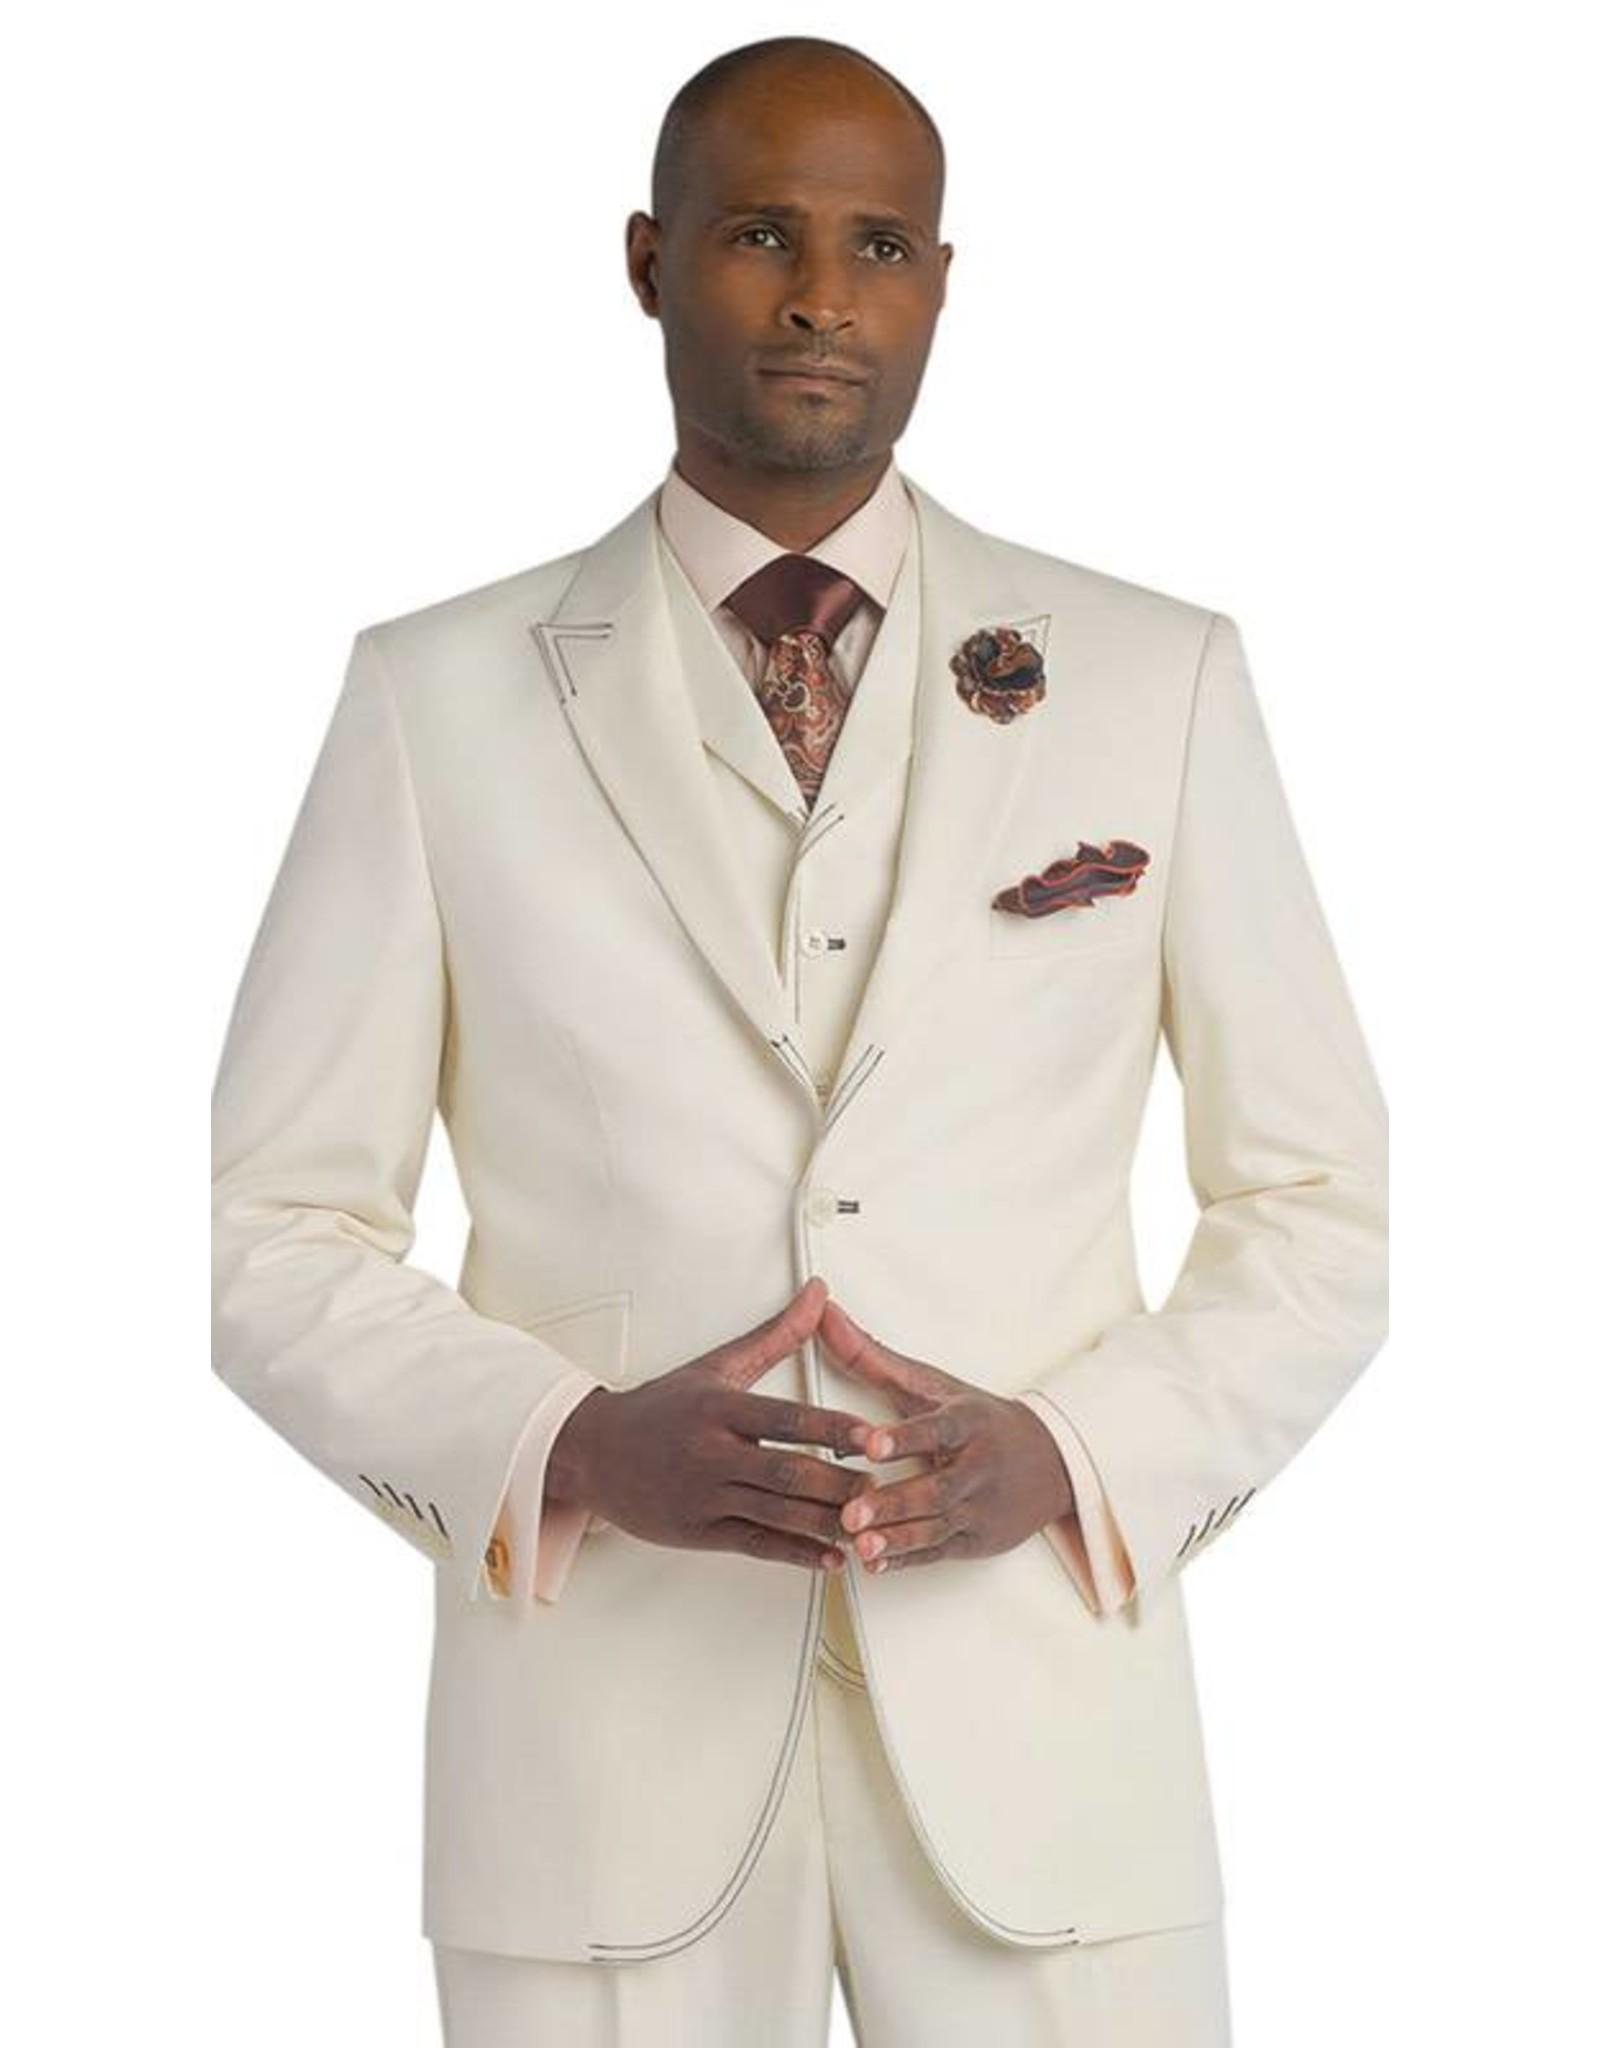 EJ Samuel EJ Samuel Vested Suit - M2688 Cream/Brown